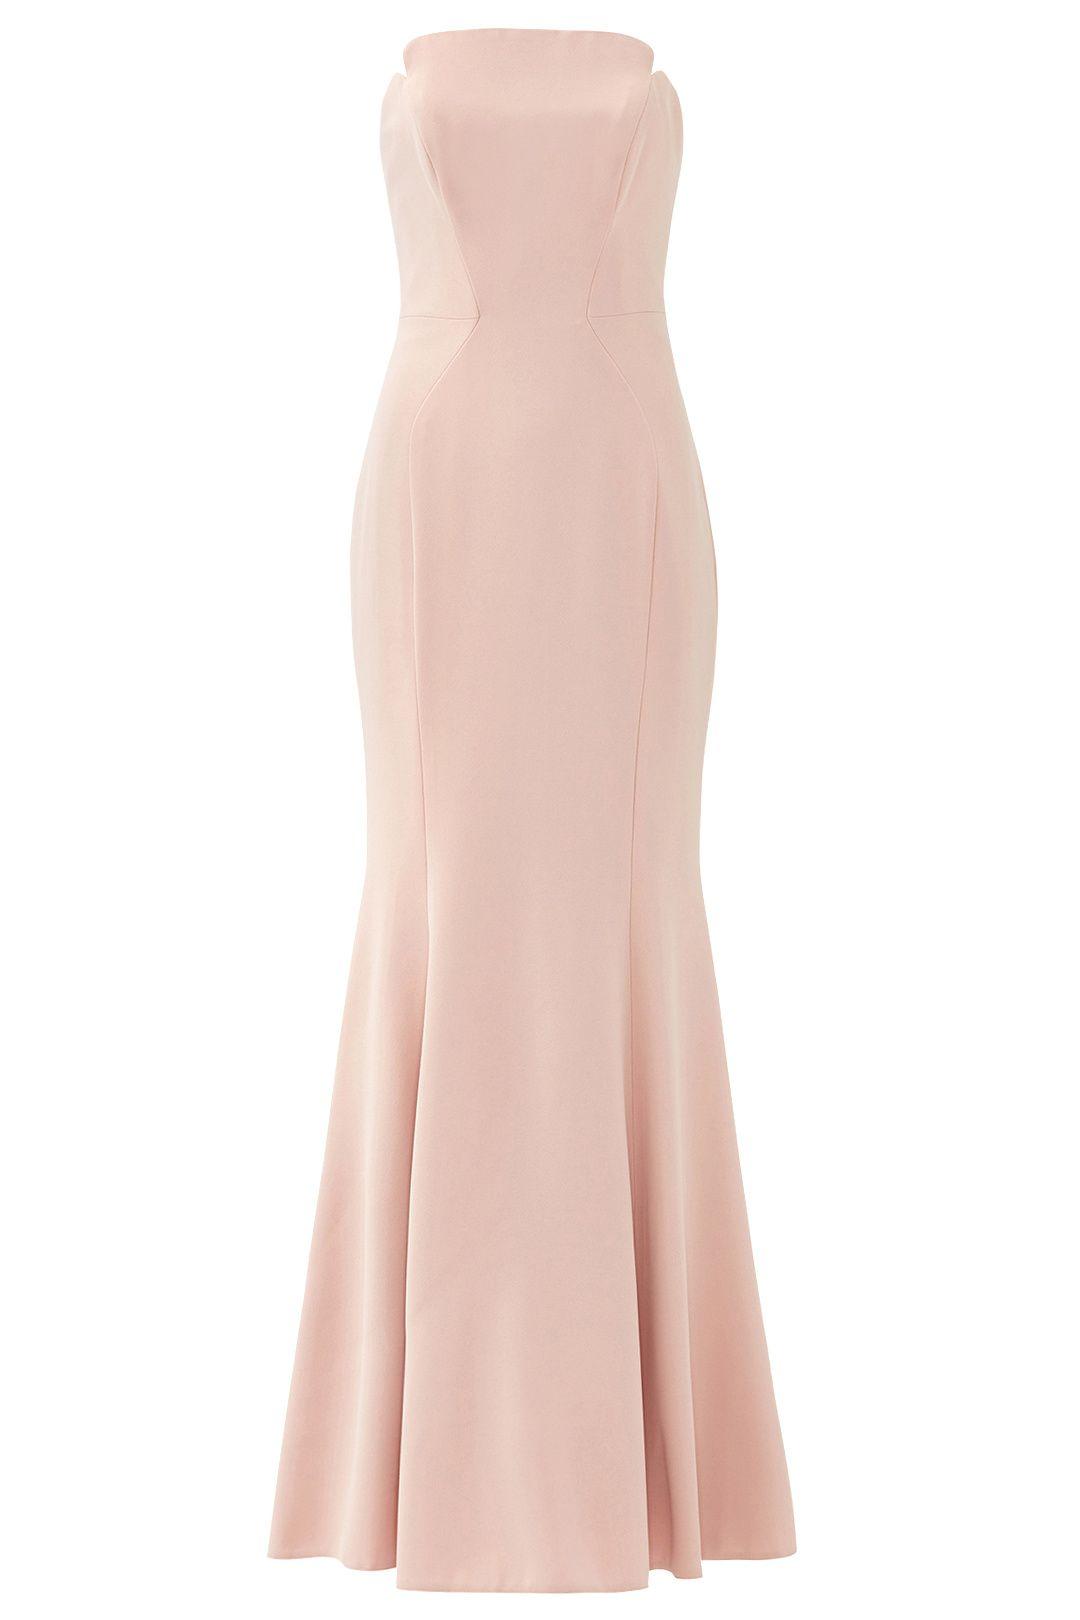 Rose Pink Academy Gown by Jill Jill Stuart for $90   Rent The Runway ...